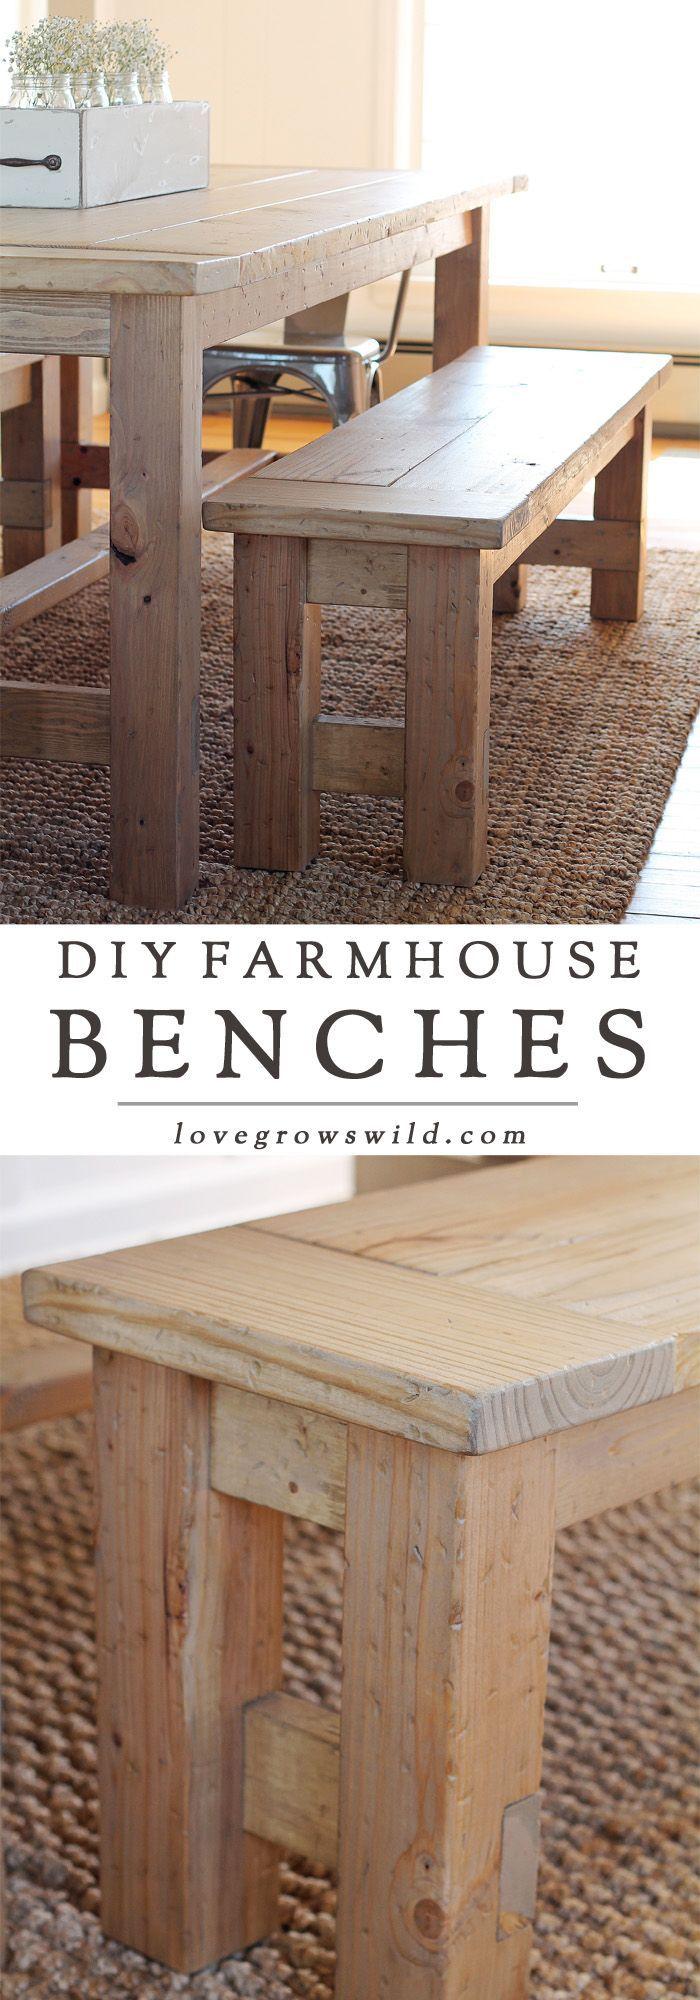 Diy Farmhouse Bench Farmhouse Bench Diy Farmhouse Diy Easy Home Decor